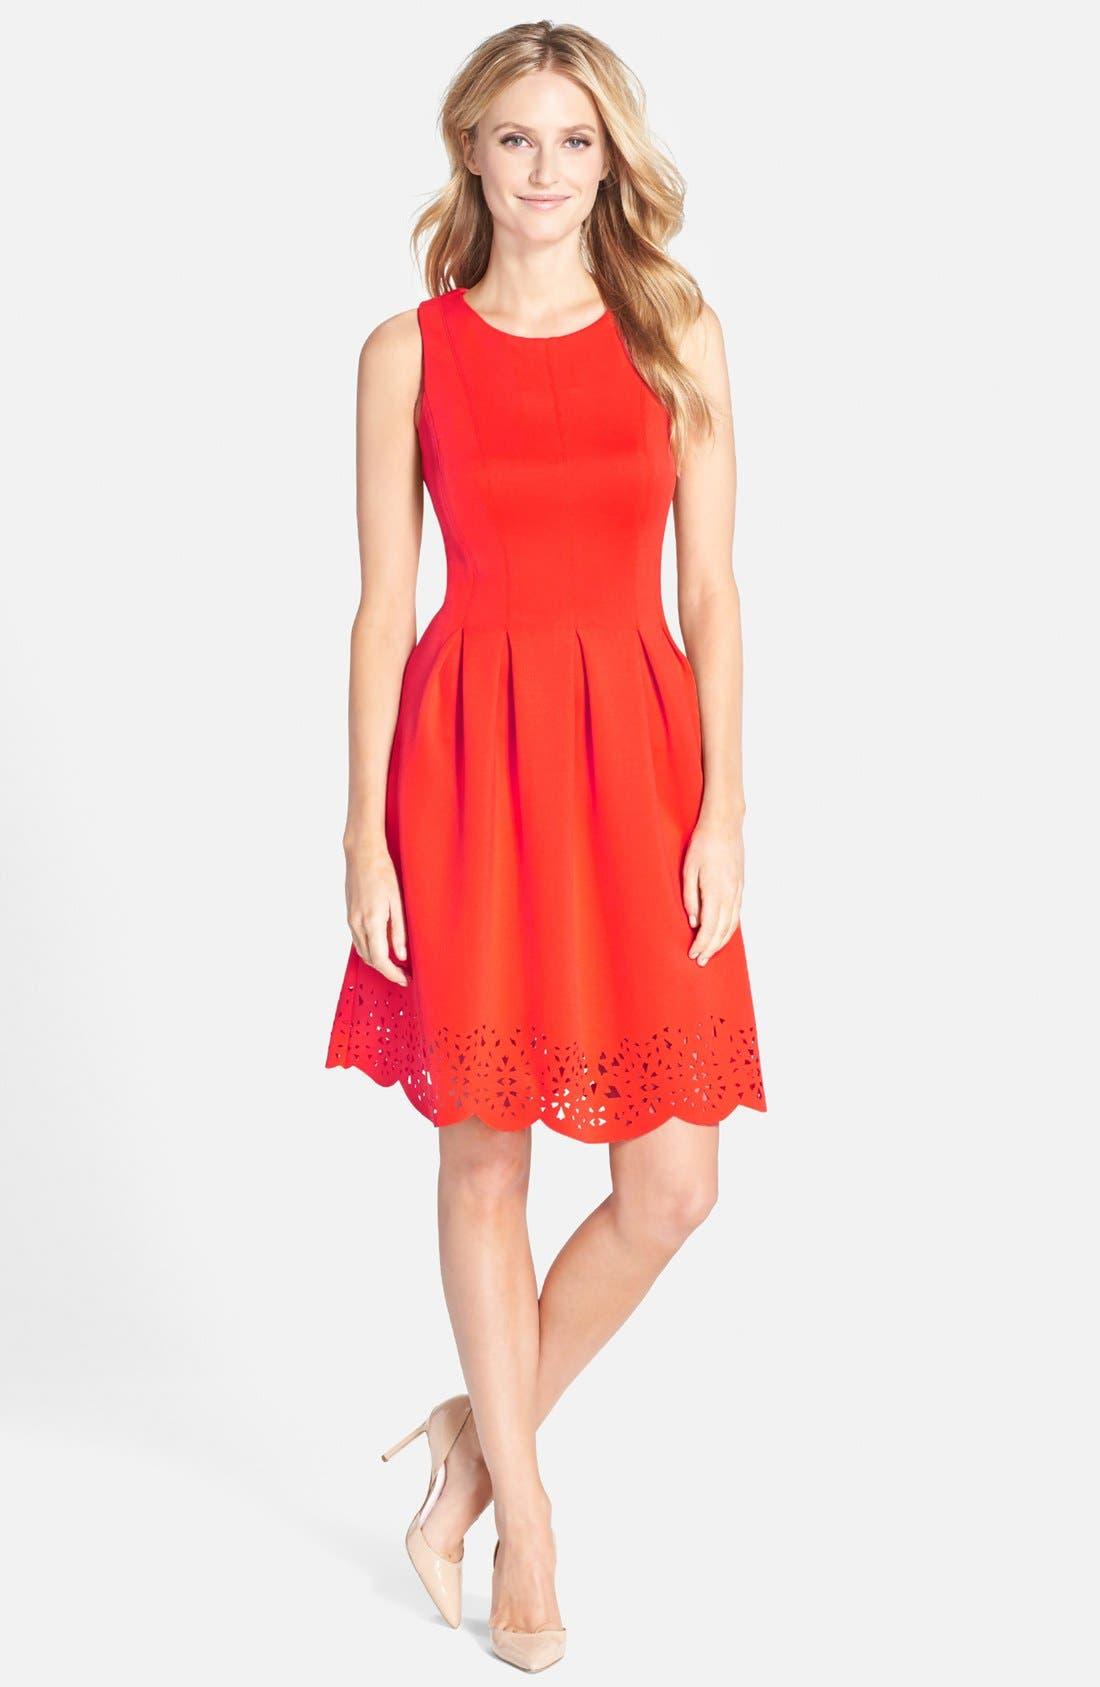 Alternate Image 1 Selected - Ivanka Trump Lasercut Scuba Fit & Flare Dress